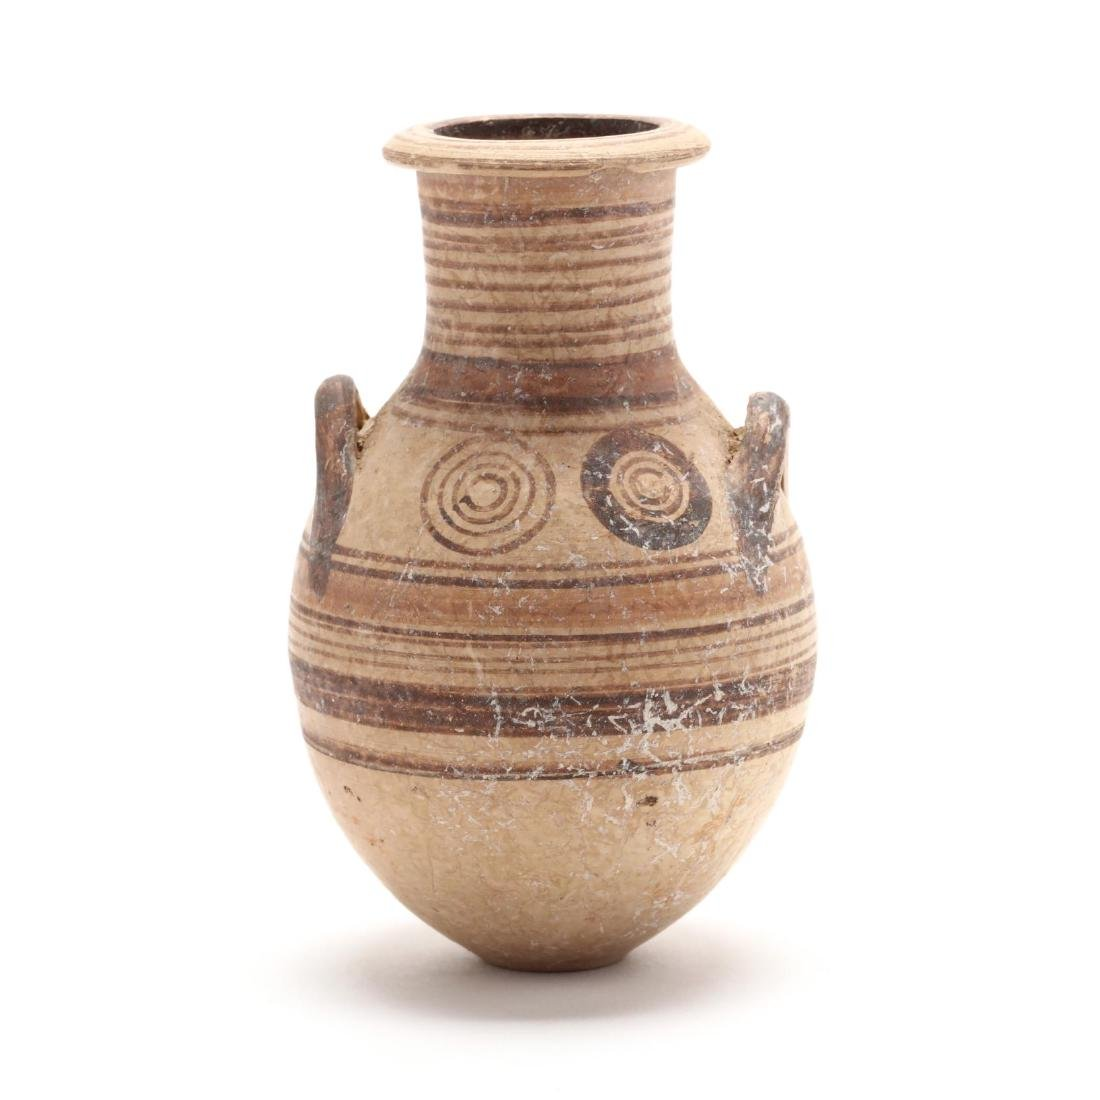 Cypro-Archaic Two-Handled Amphoriskos